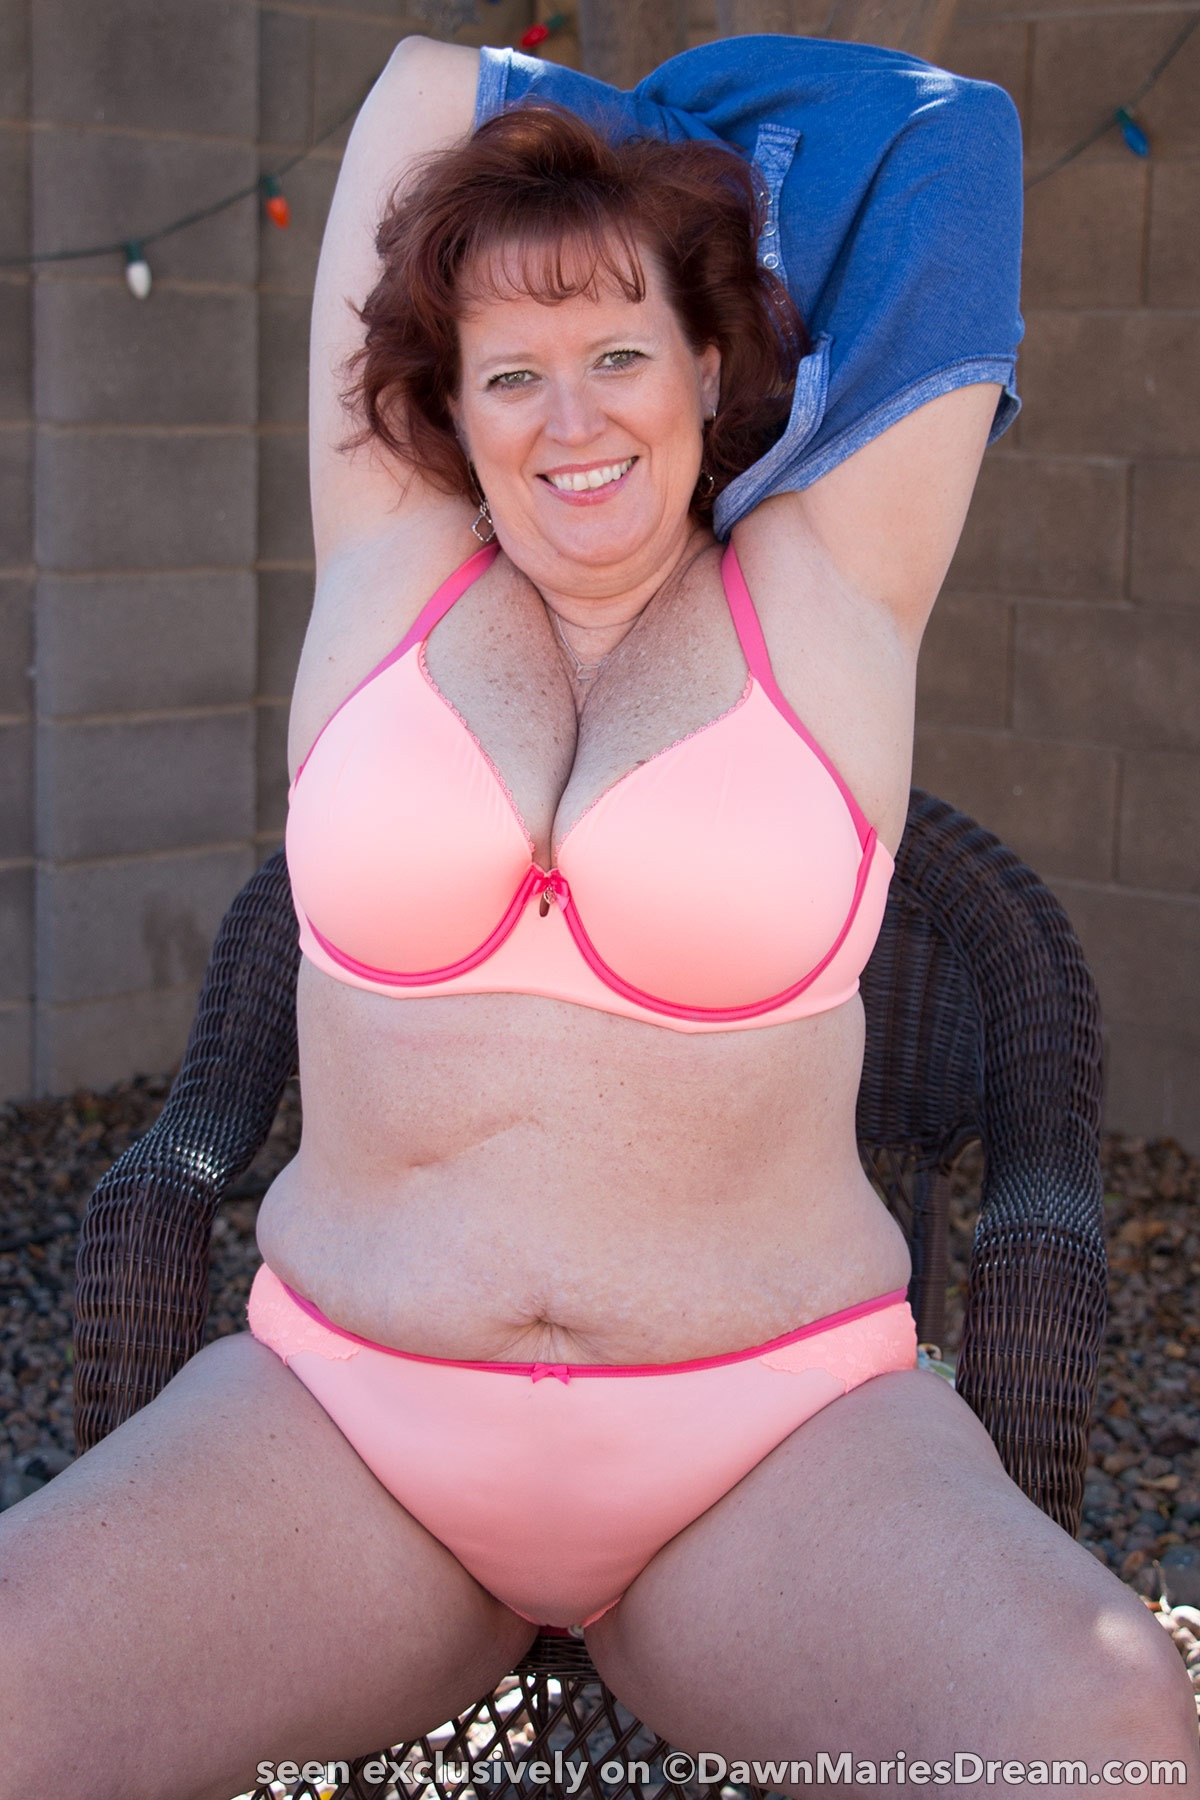 amanda young topless nude